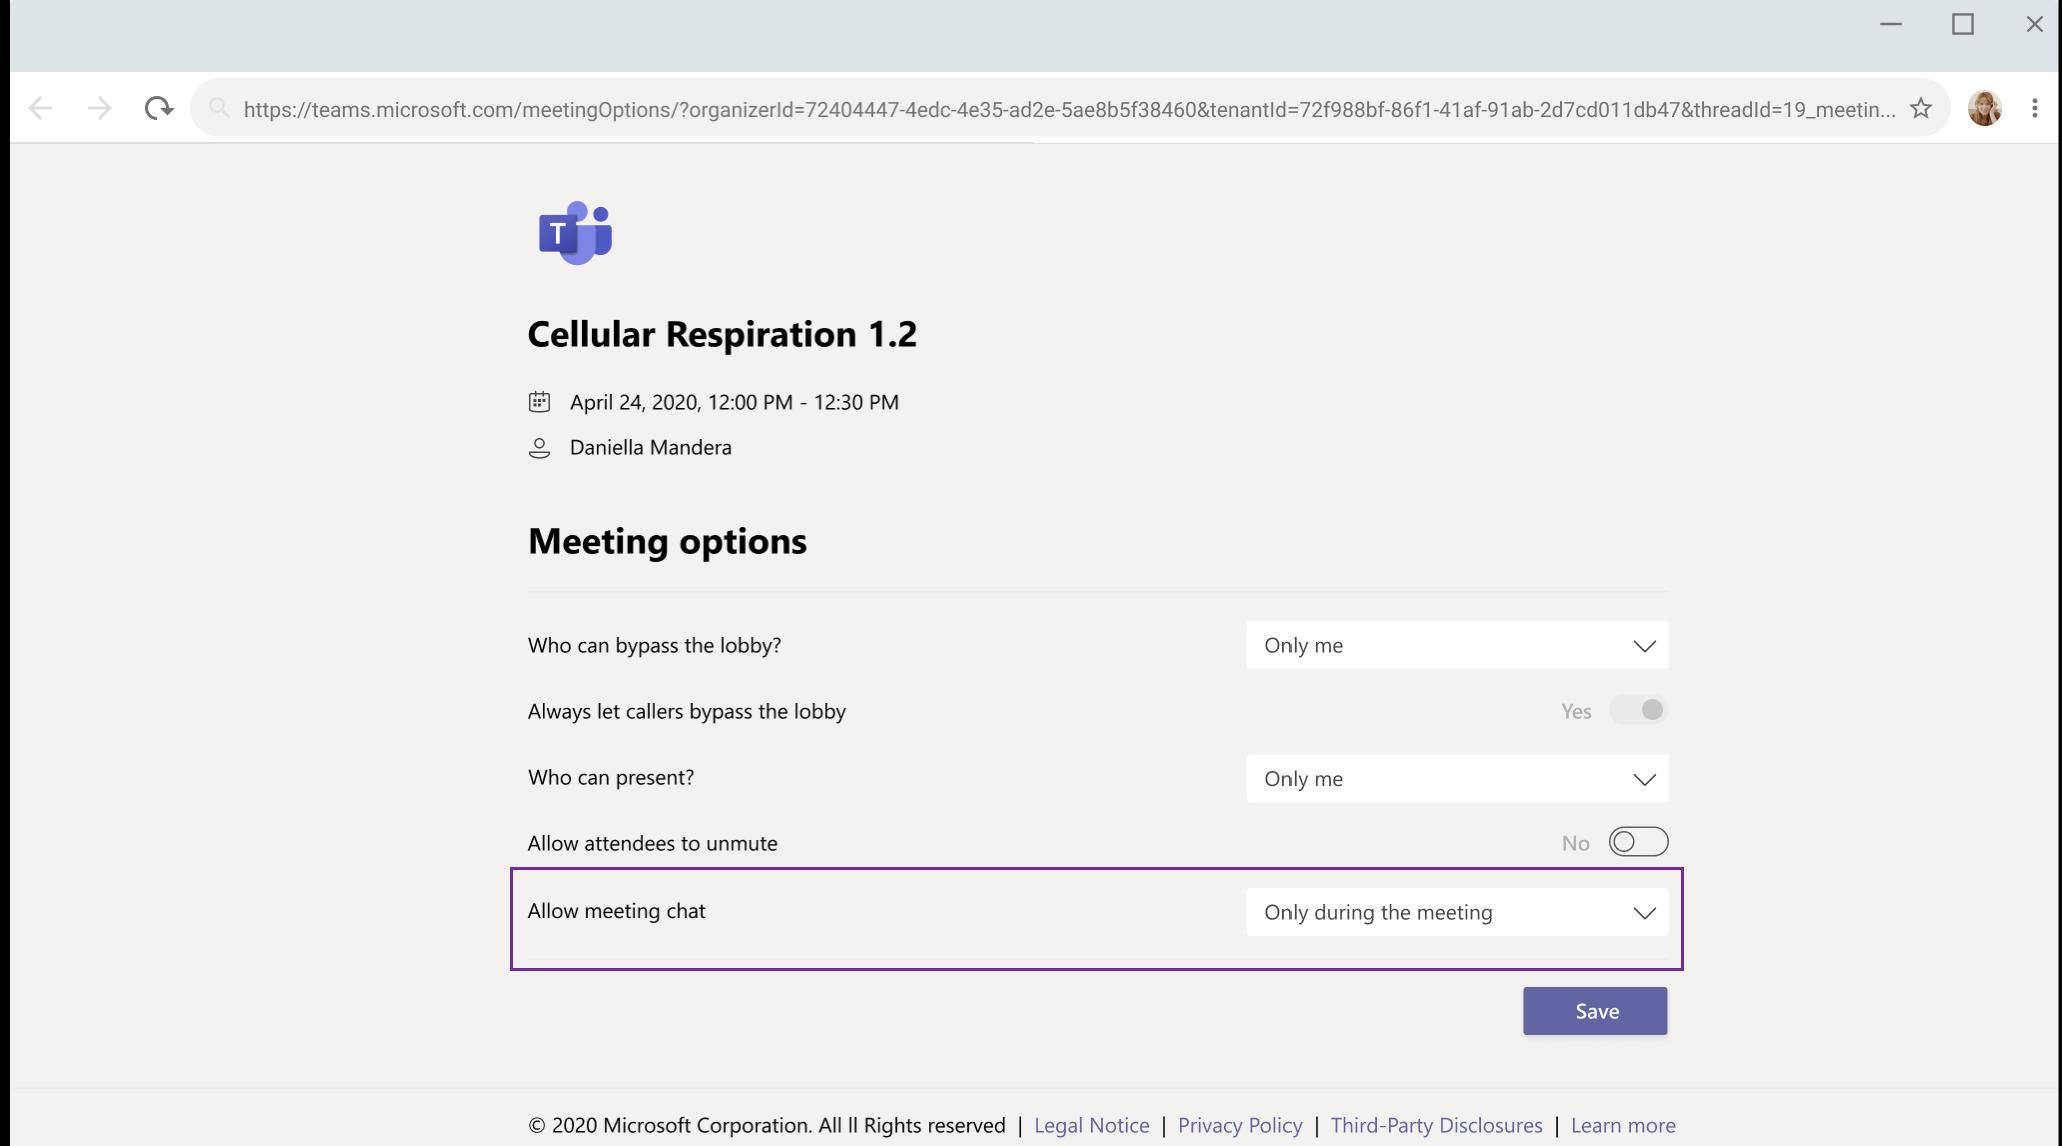 Microsoft将很快允许会议组织者在Teams会议期间使聊天静音